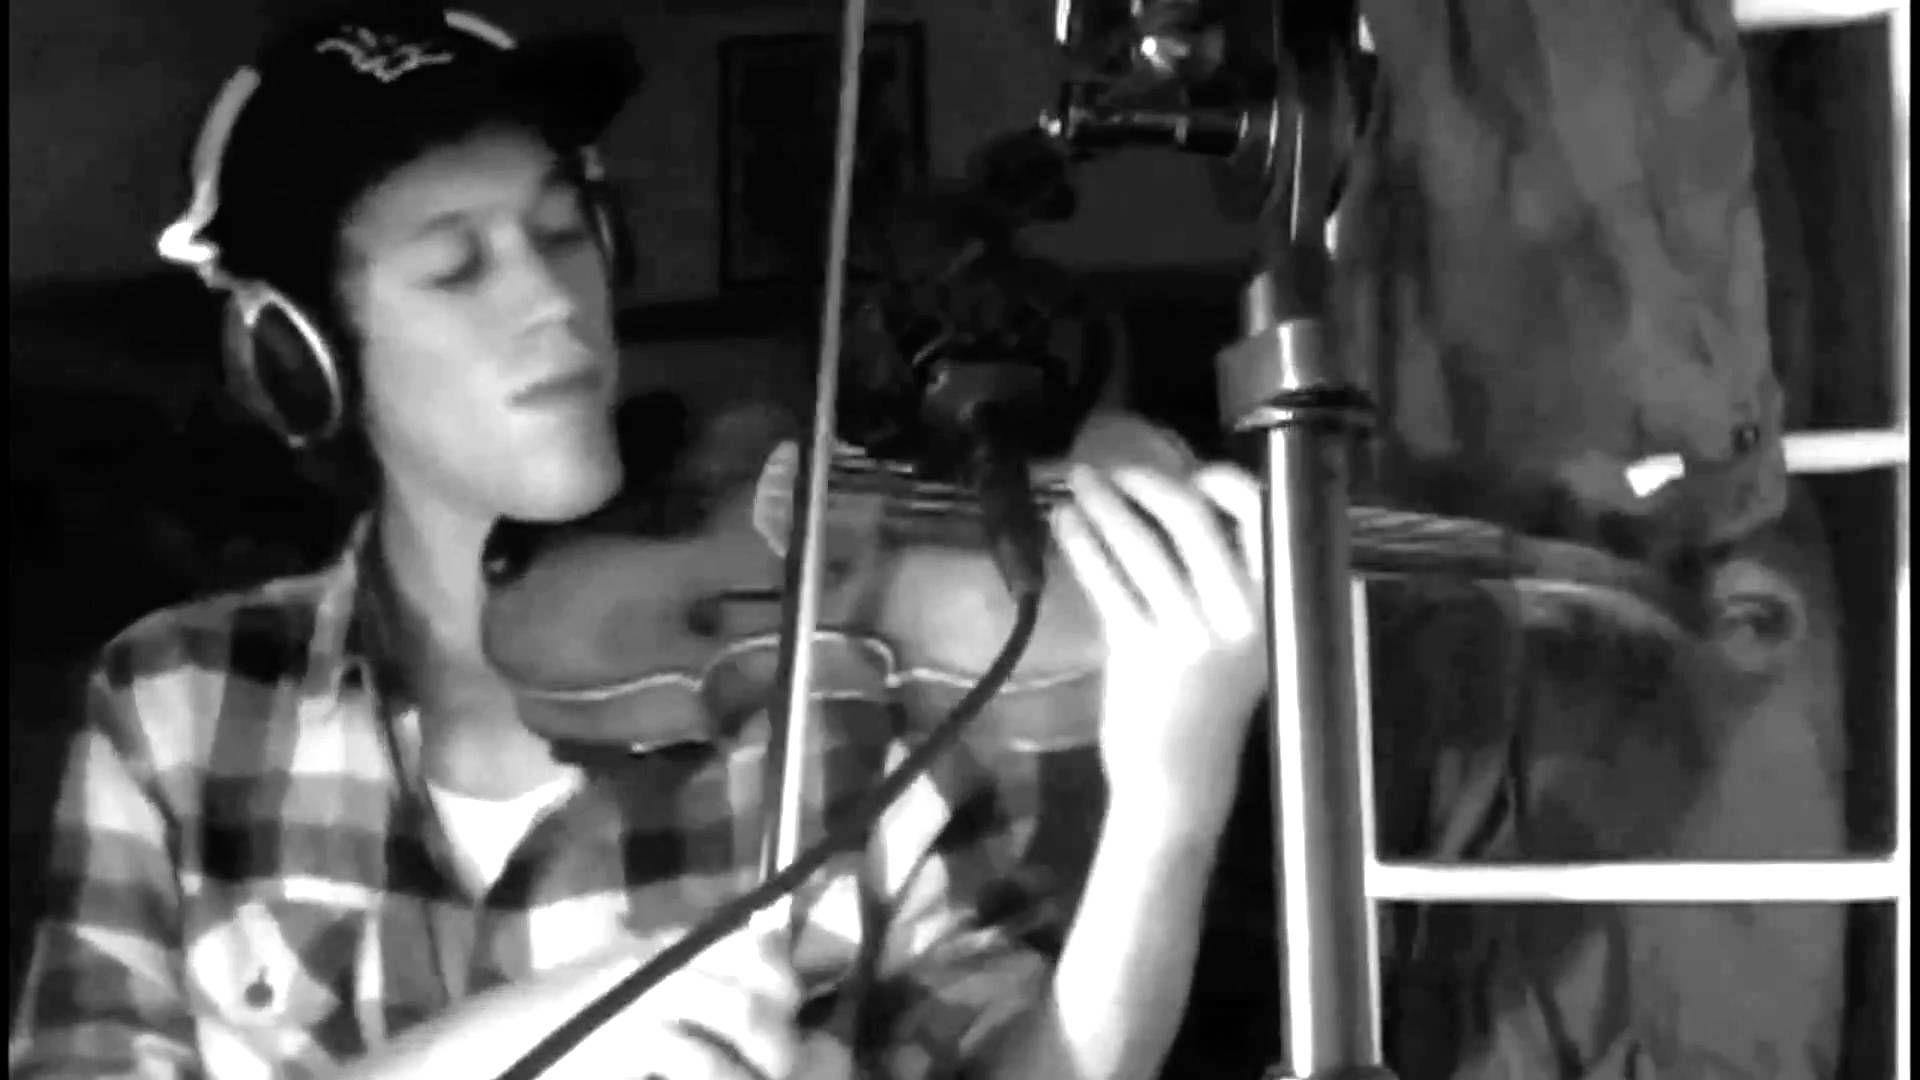 Alicia Keys If I Ain T Got You Audio Download versão em violino  peter lee, alicia keys, violin